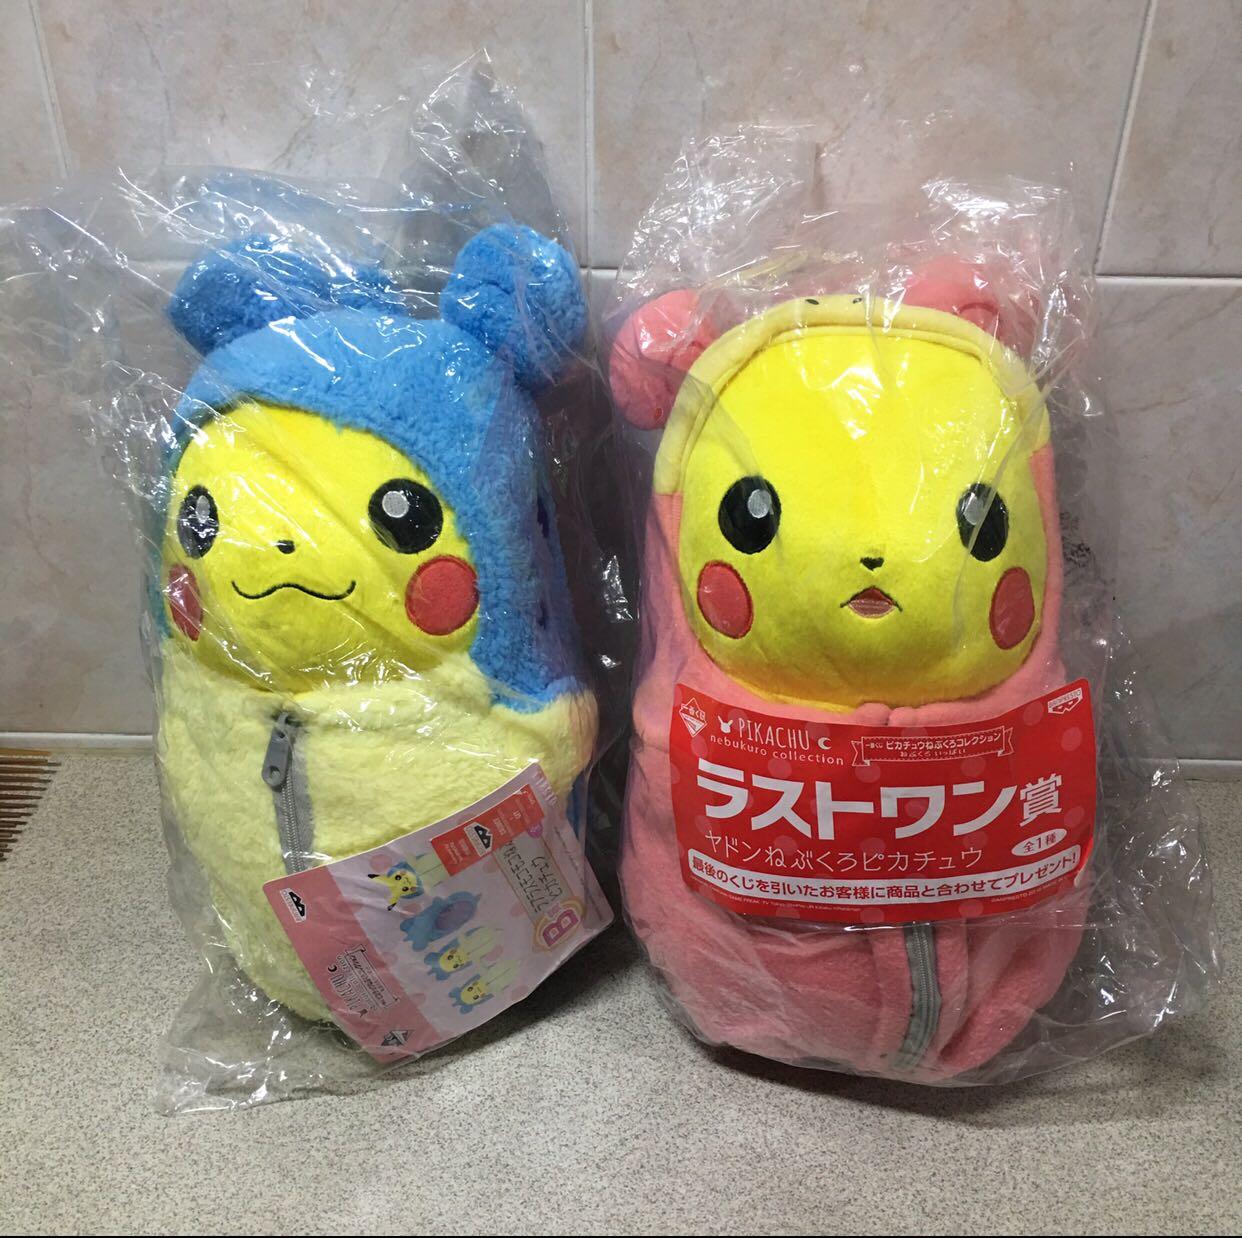 Ichiban Kuji 2019 Pokemon Collection Pikachu Plush Doll A Prize BANDAI